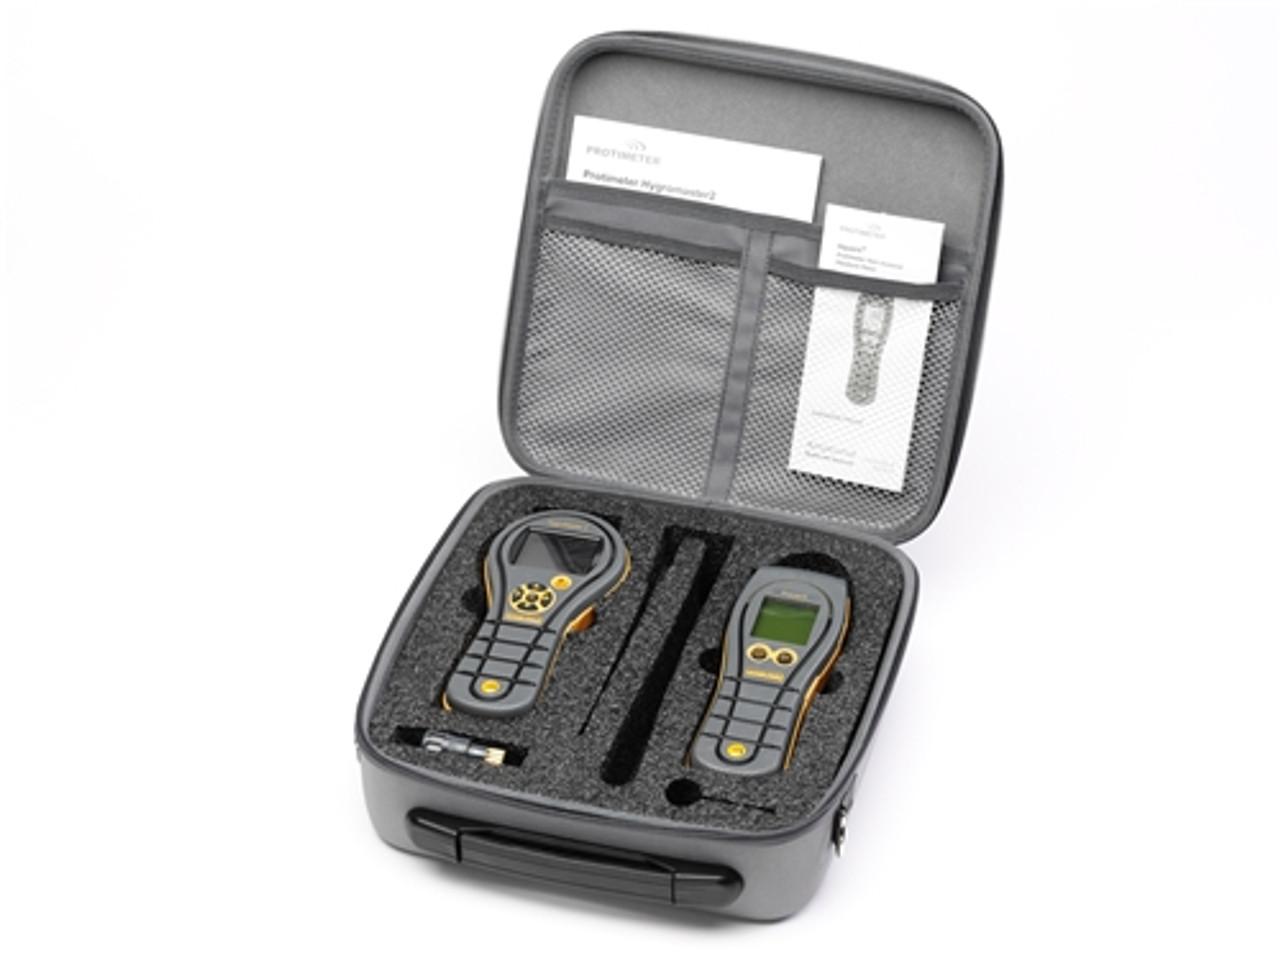 Protimeter HygroMaster 2 and Aquant Kit (Temperature, RH & Non-Destructive Moisture Meter) - BLD7714-AQ